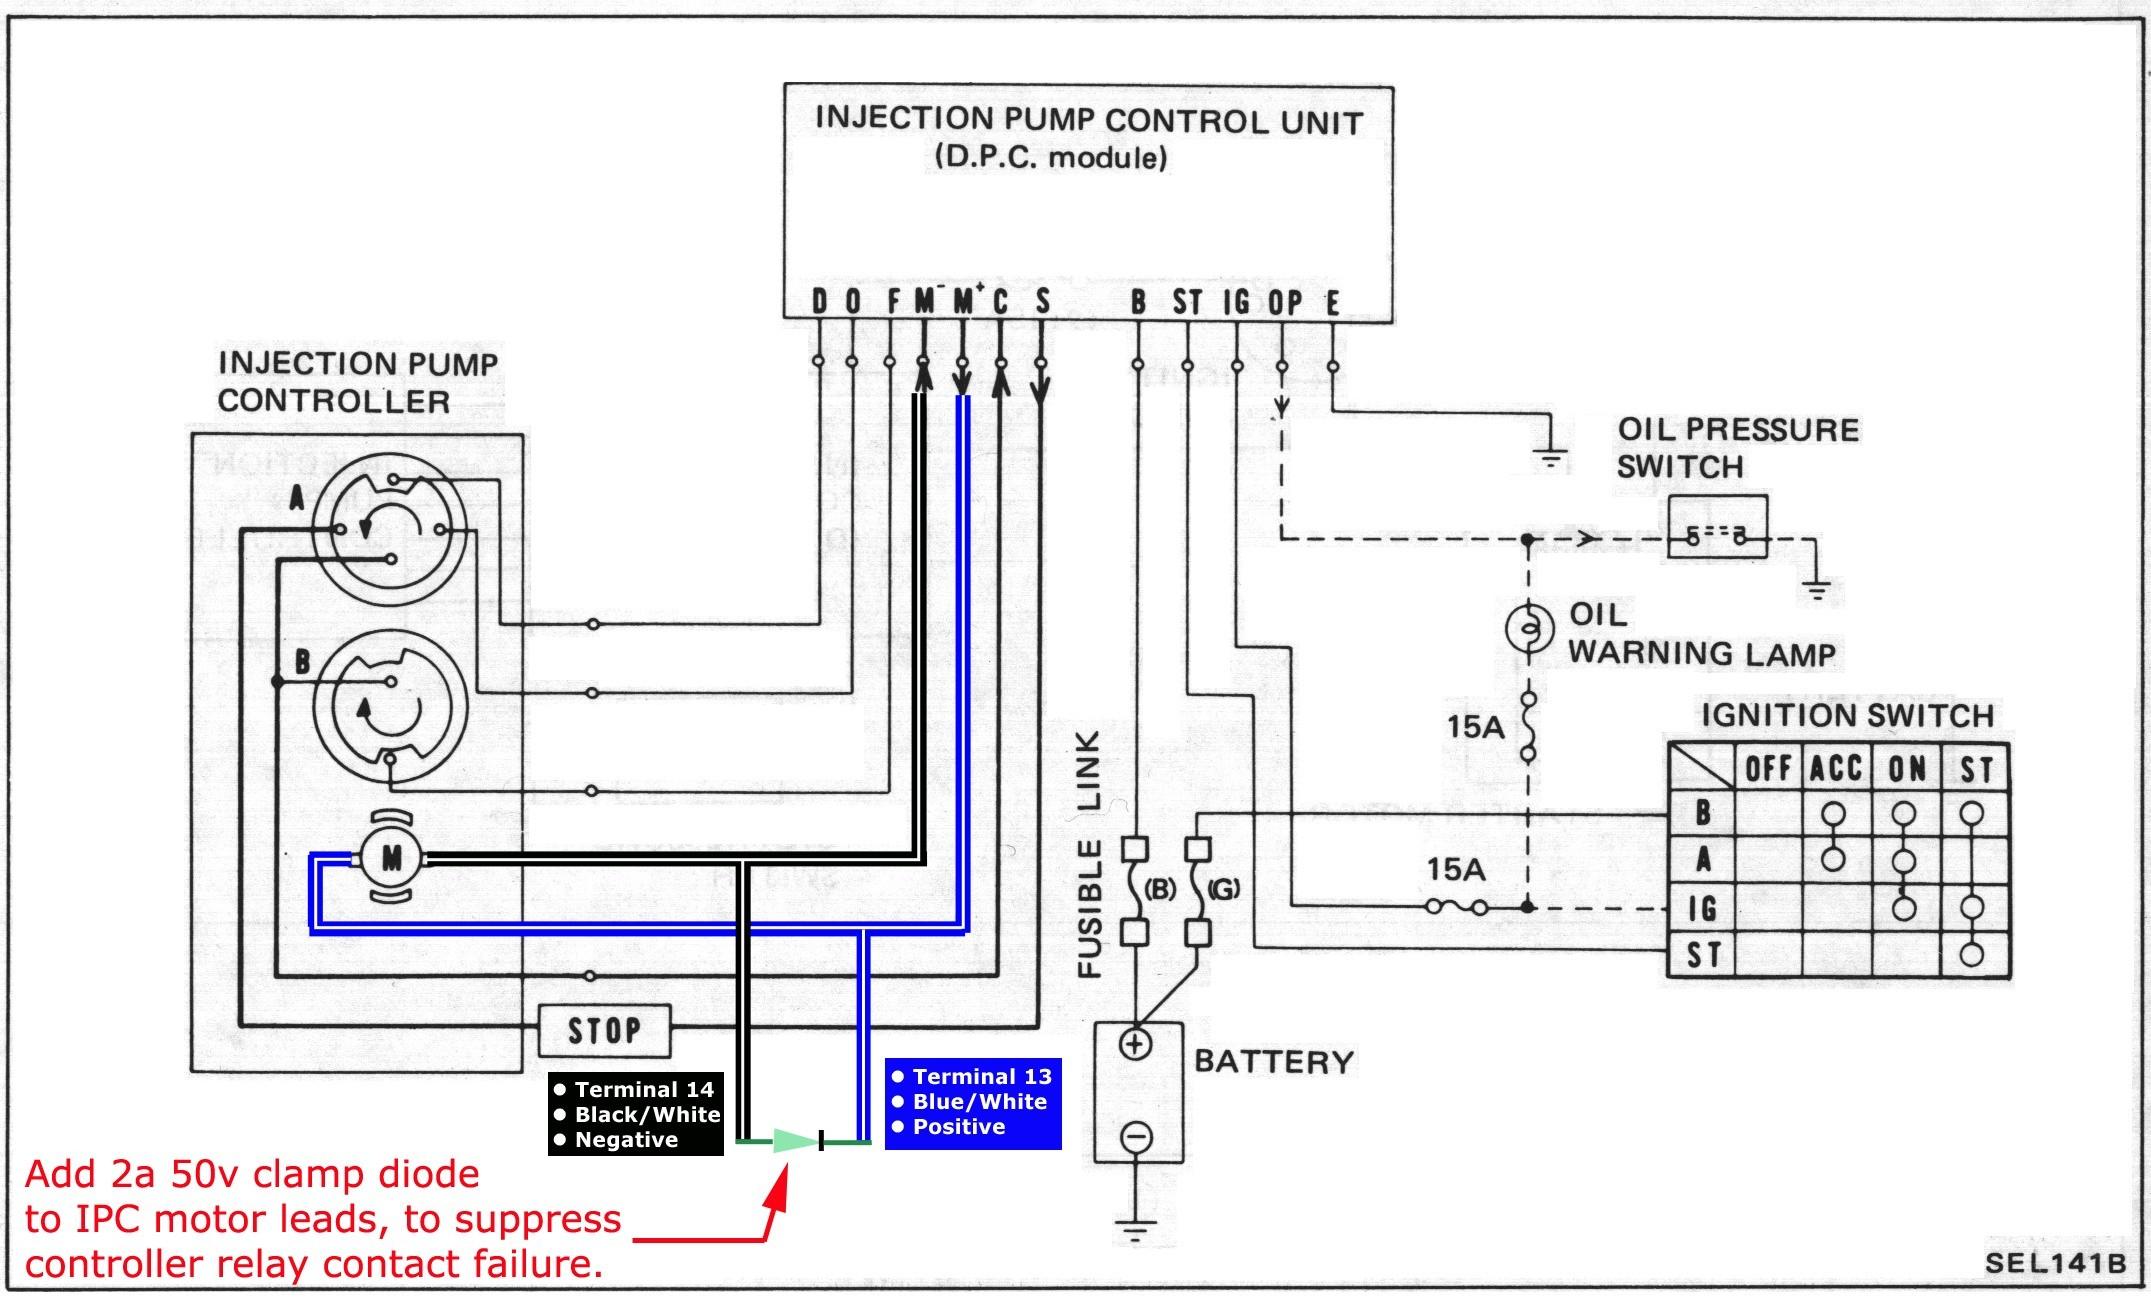 2000 nissan frontier engine diagram wiring diagram toyota v6 engine parts diagram